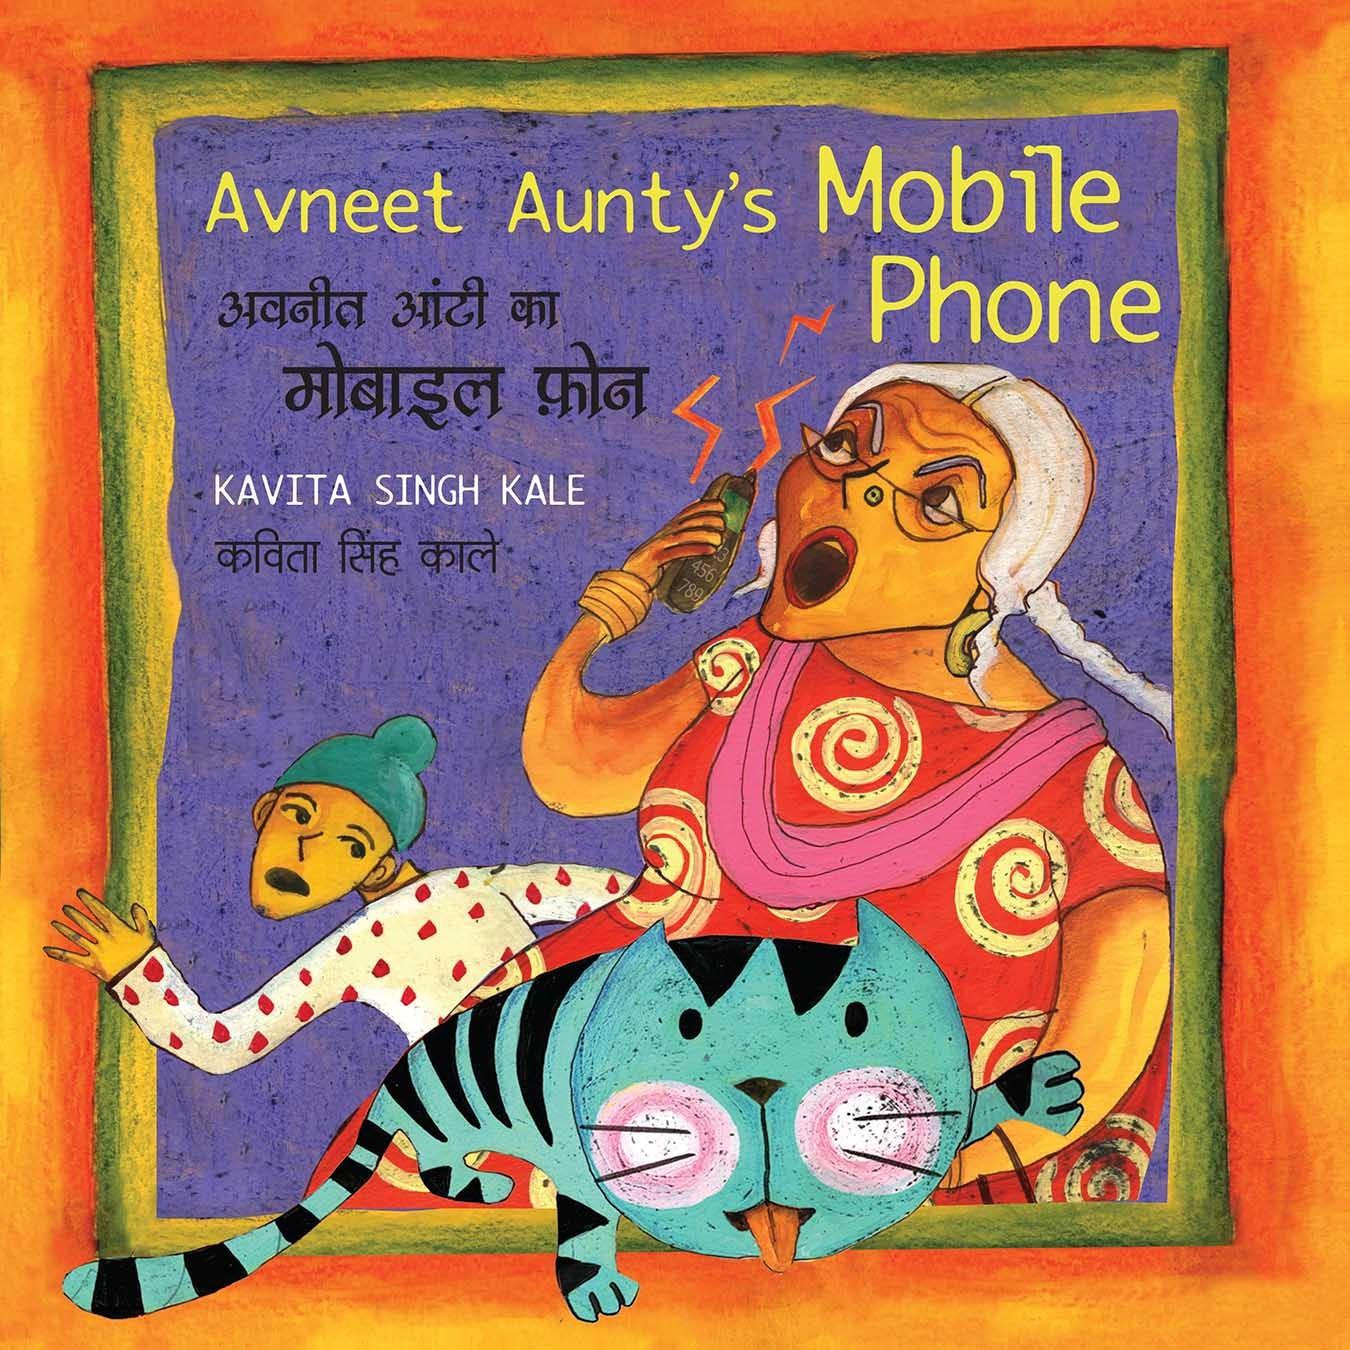 Avneet Aunty's Mobile Phone/Avneet Aunty Ka Mobile Phone (English-Hindi)